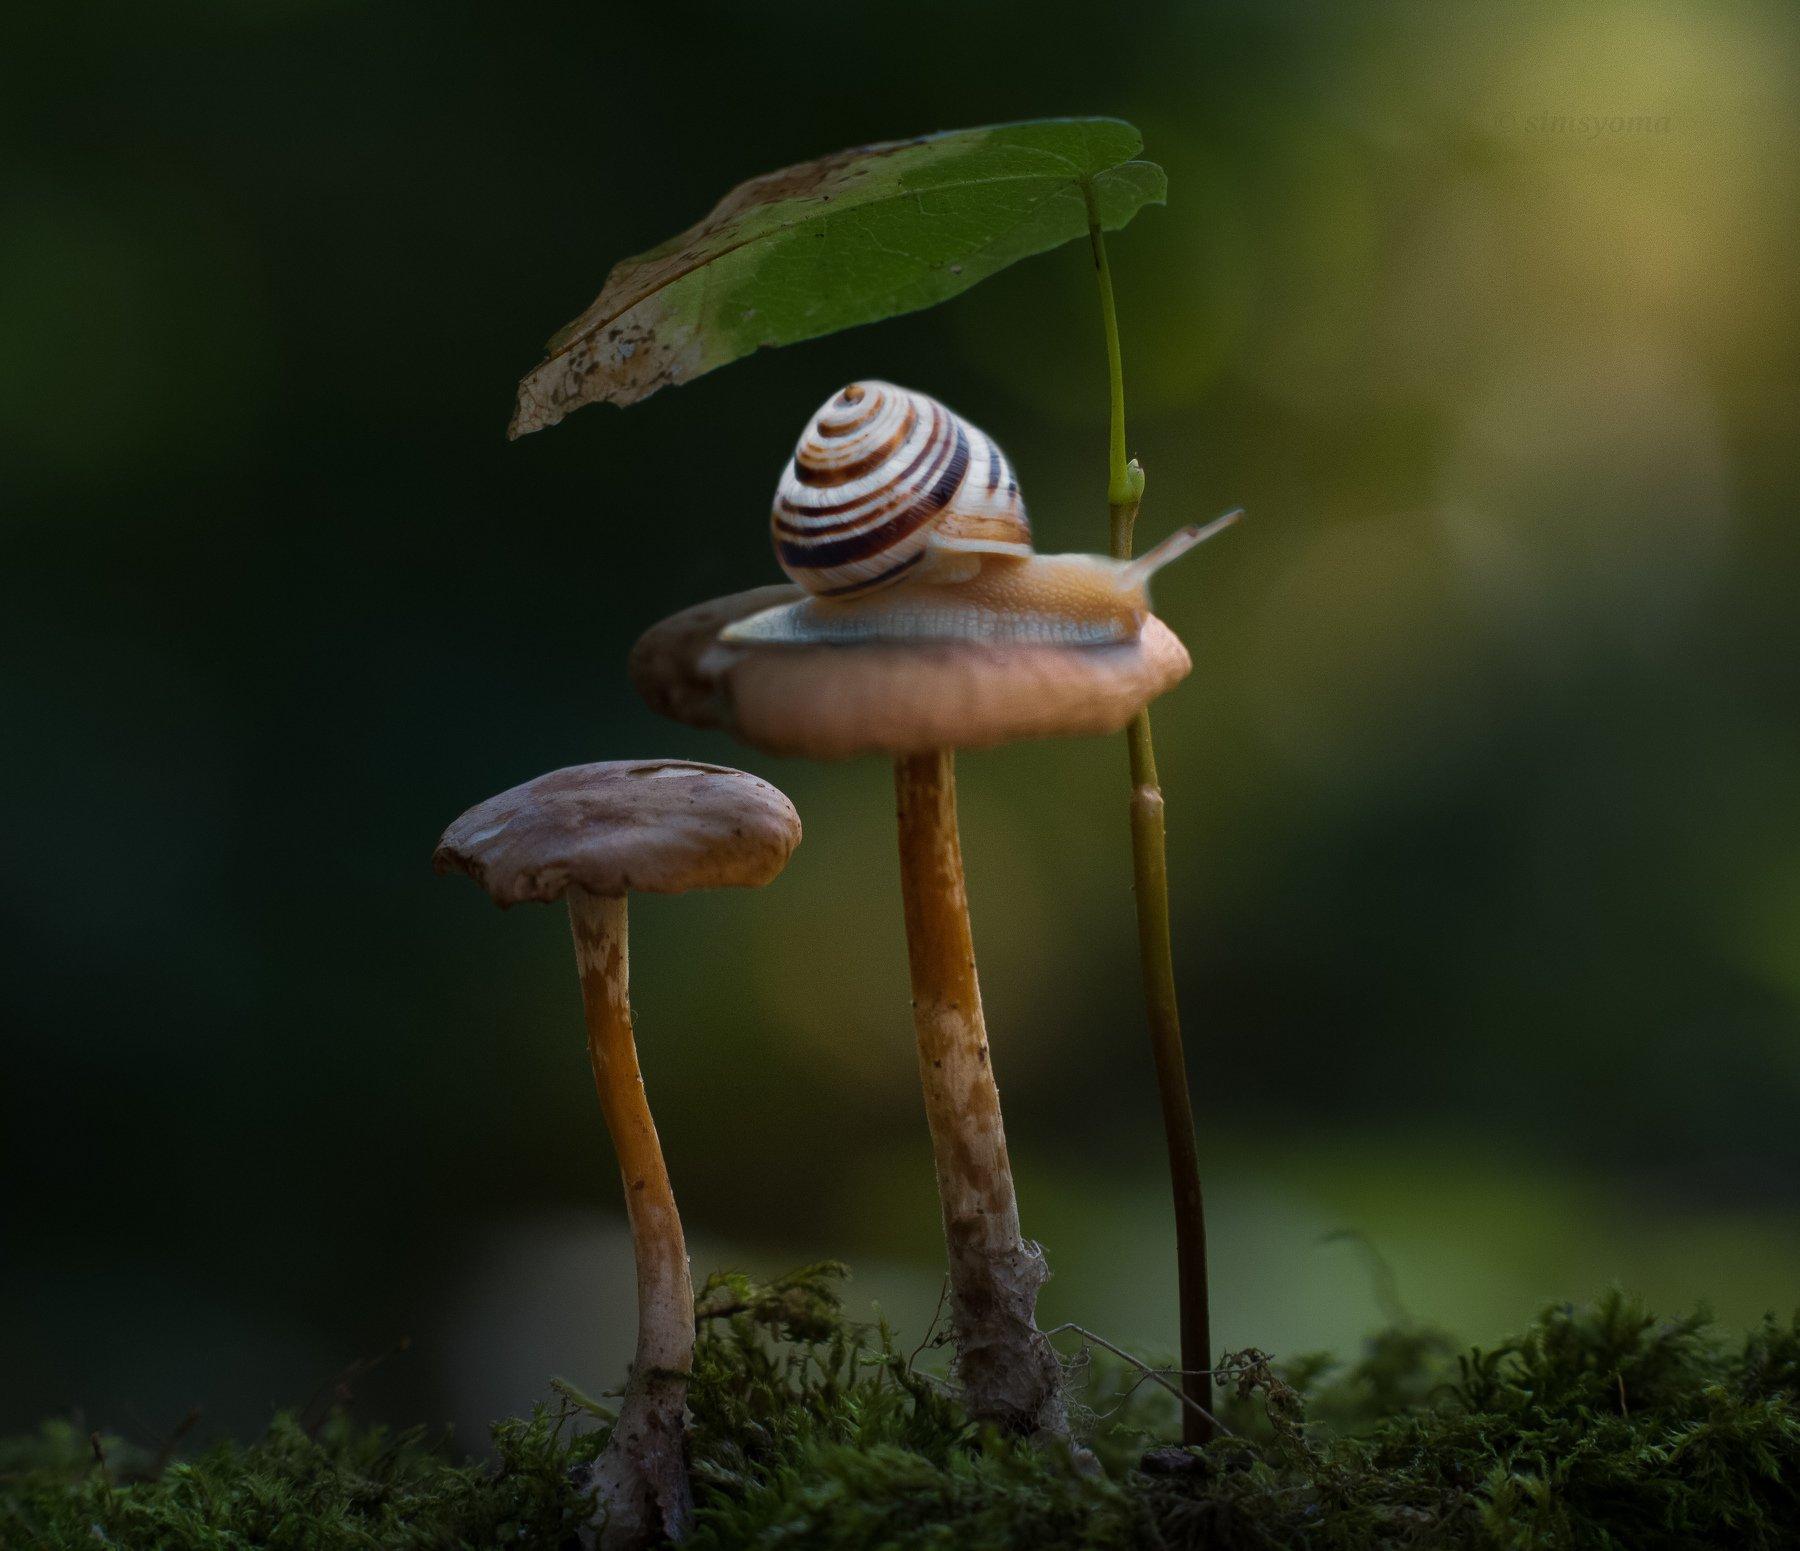 макро, природа, nature, macro, улитка, insect, snail, грибы, лес, Хворостяная Юлия